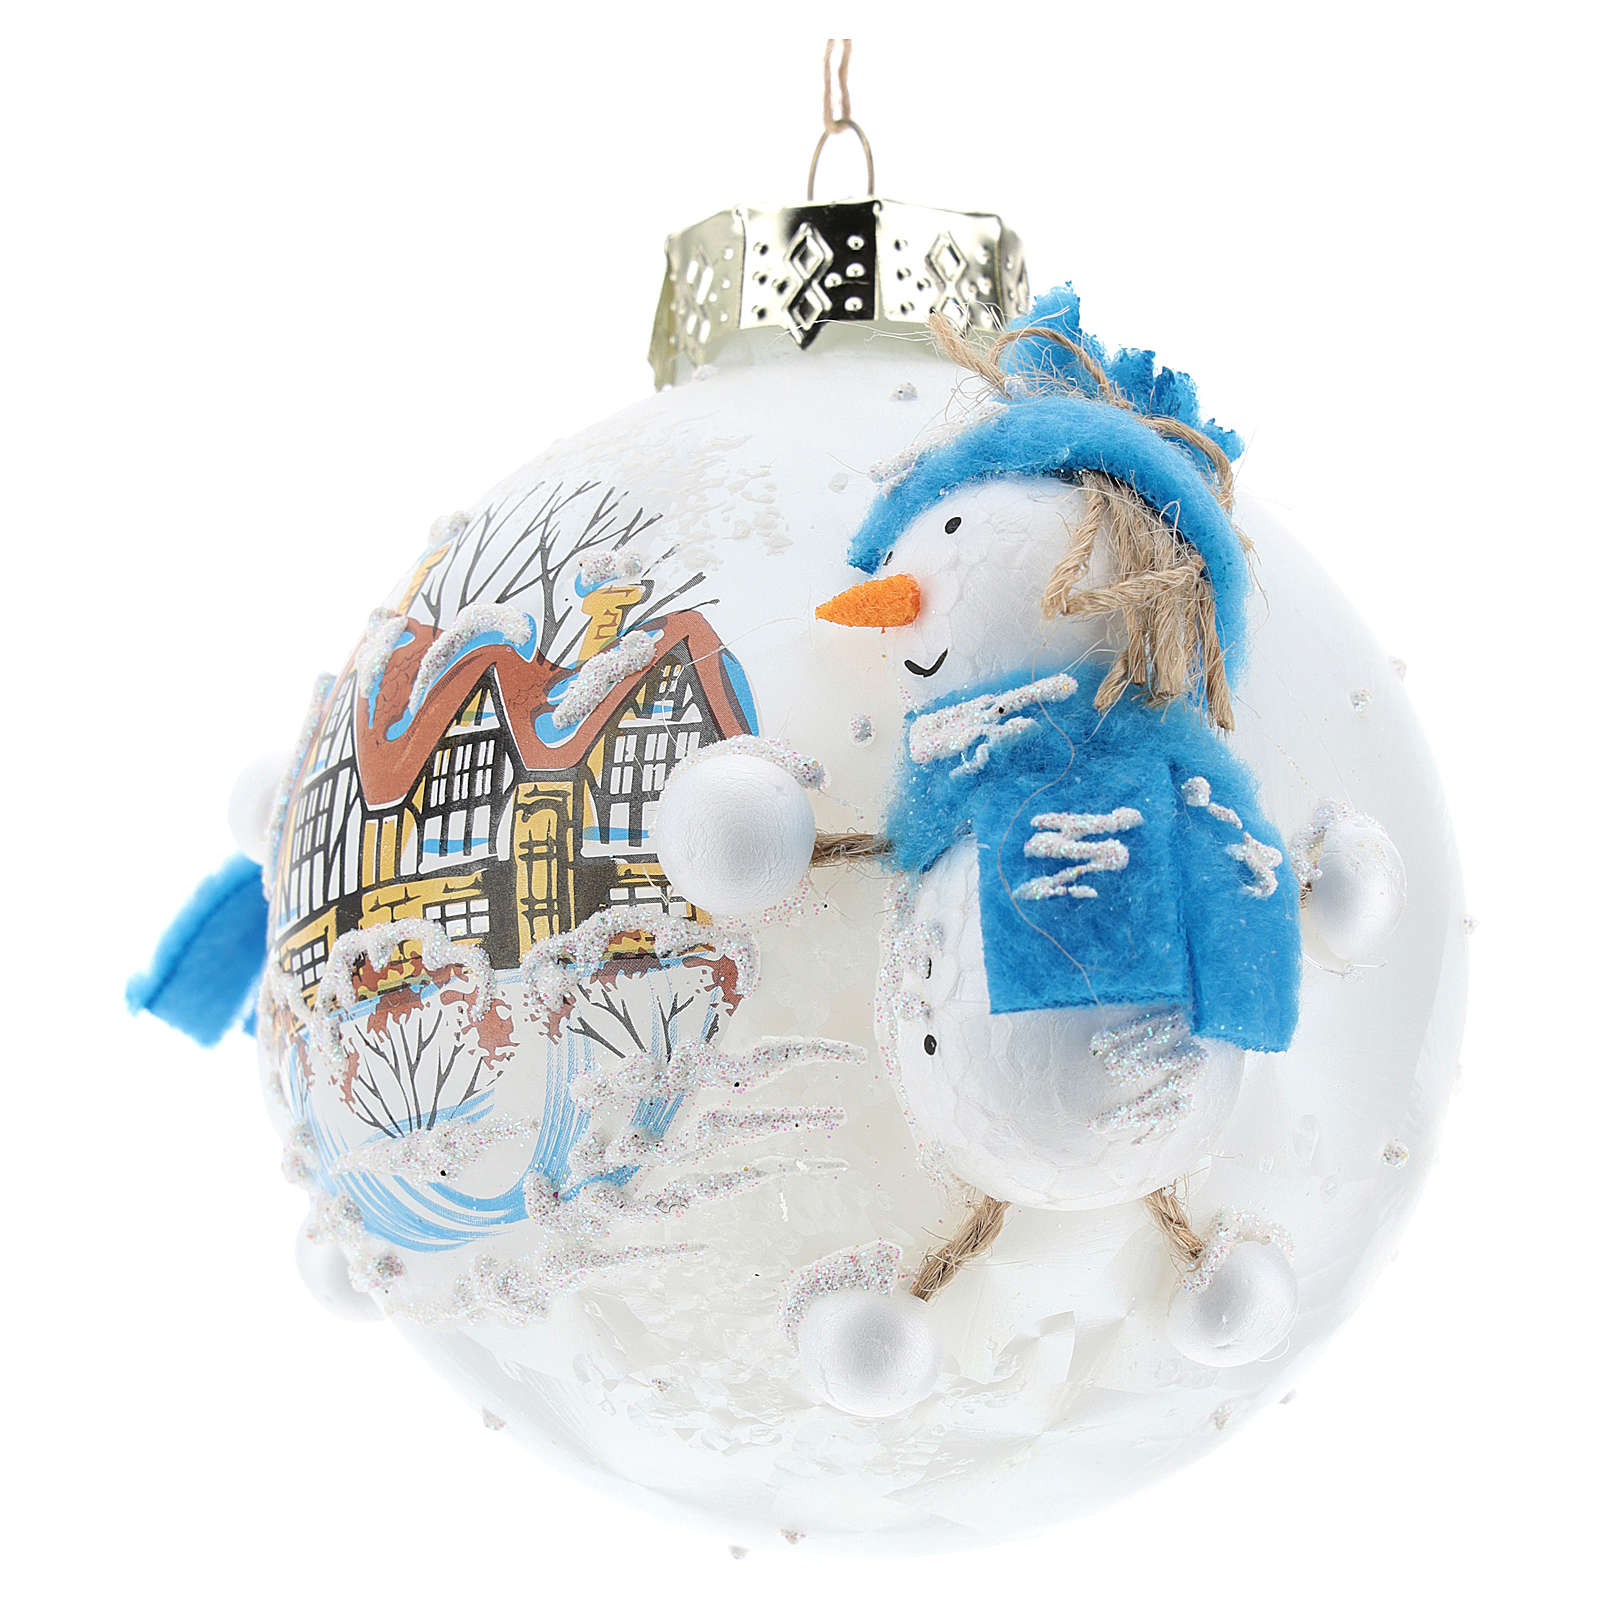 Pallina Natale con pupazzi di neve 80 mm 4